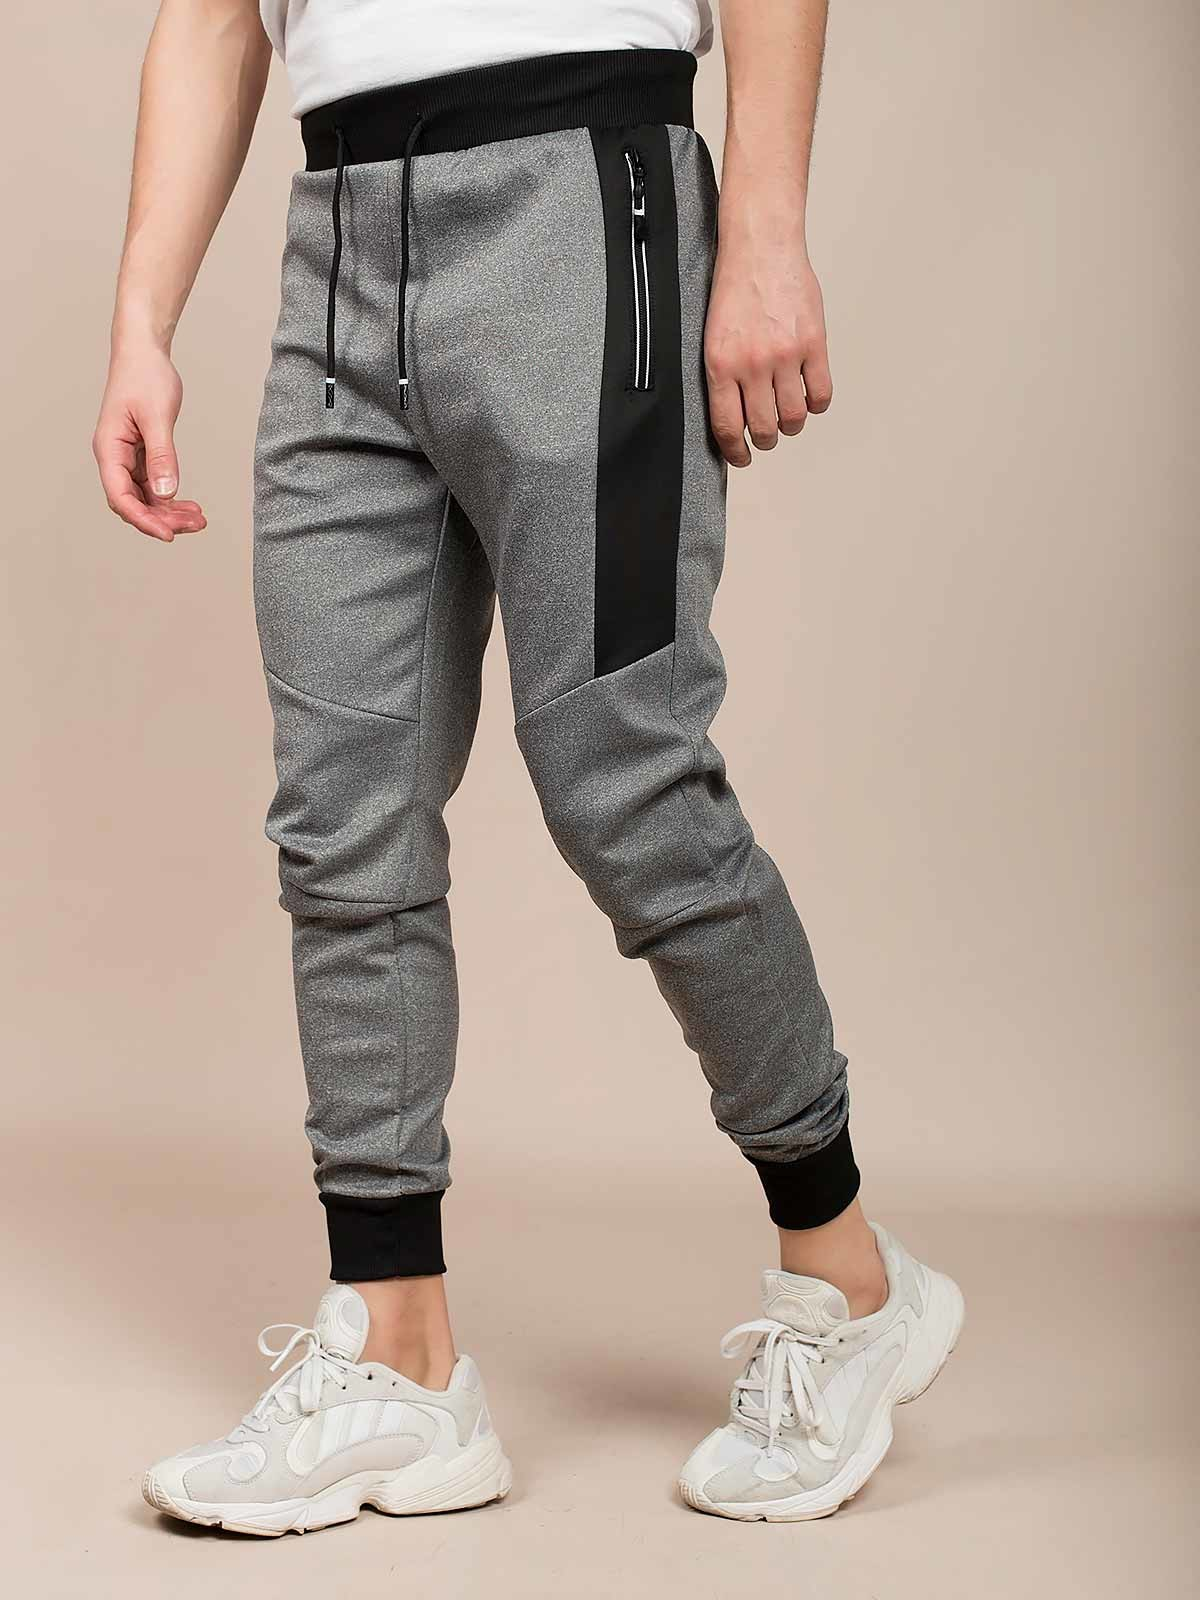 Pantalones deportivos mixtos